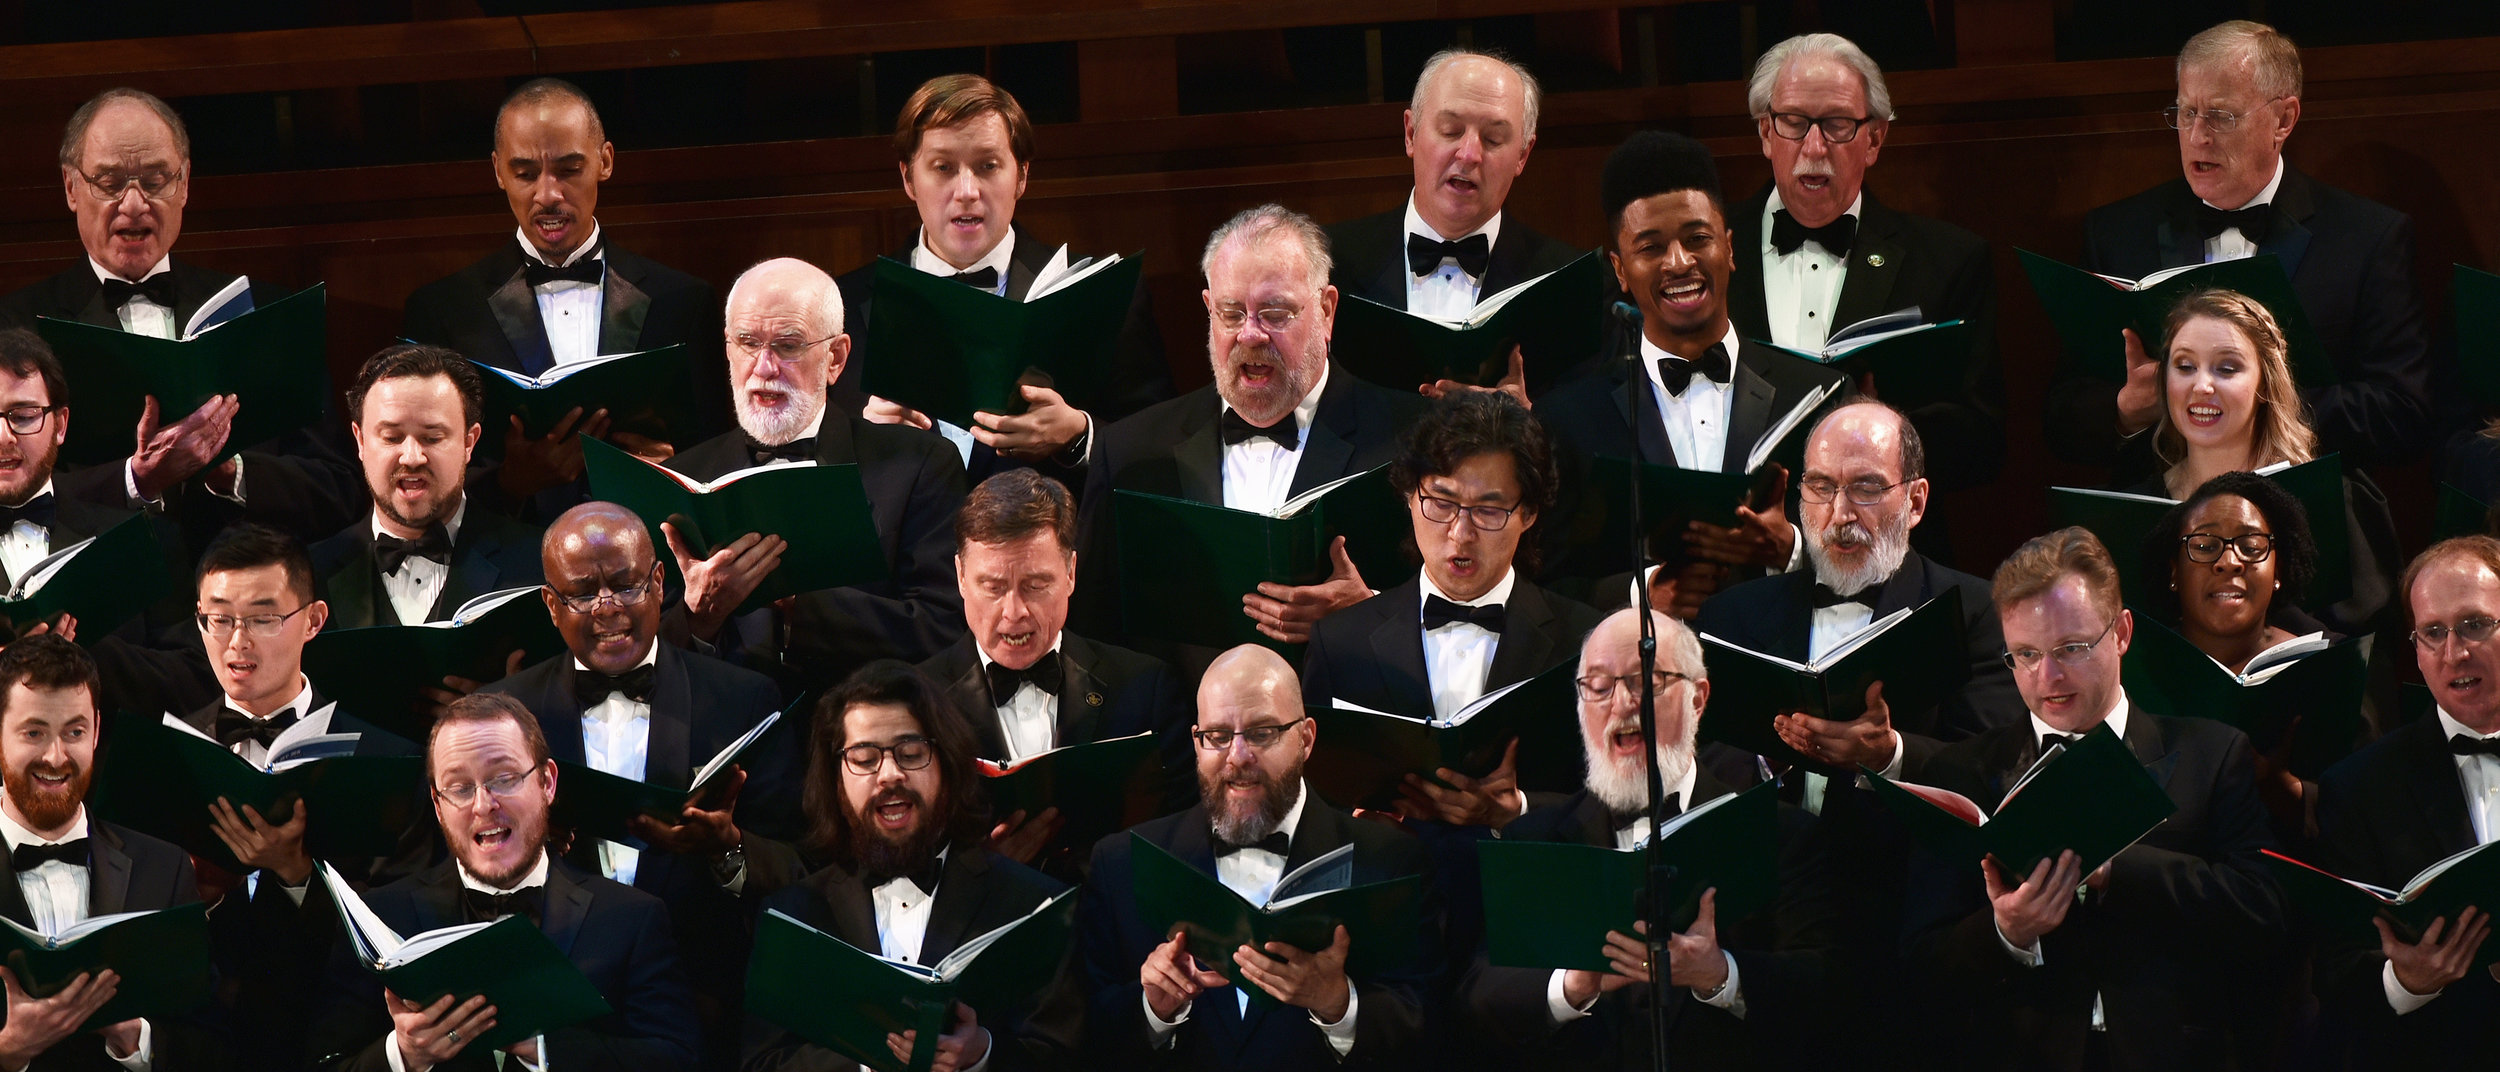 Washington Chorus Christmas Concerts 2020 Concerts 2020 21 — The Washington Chorus